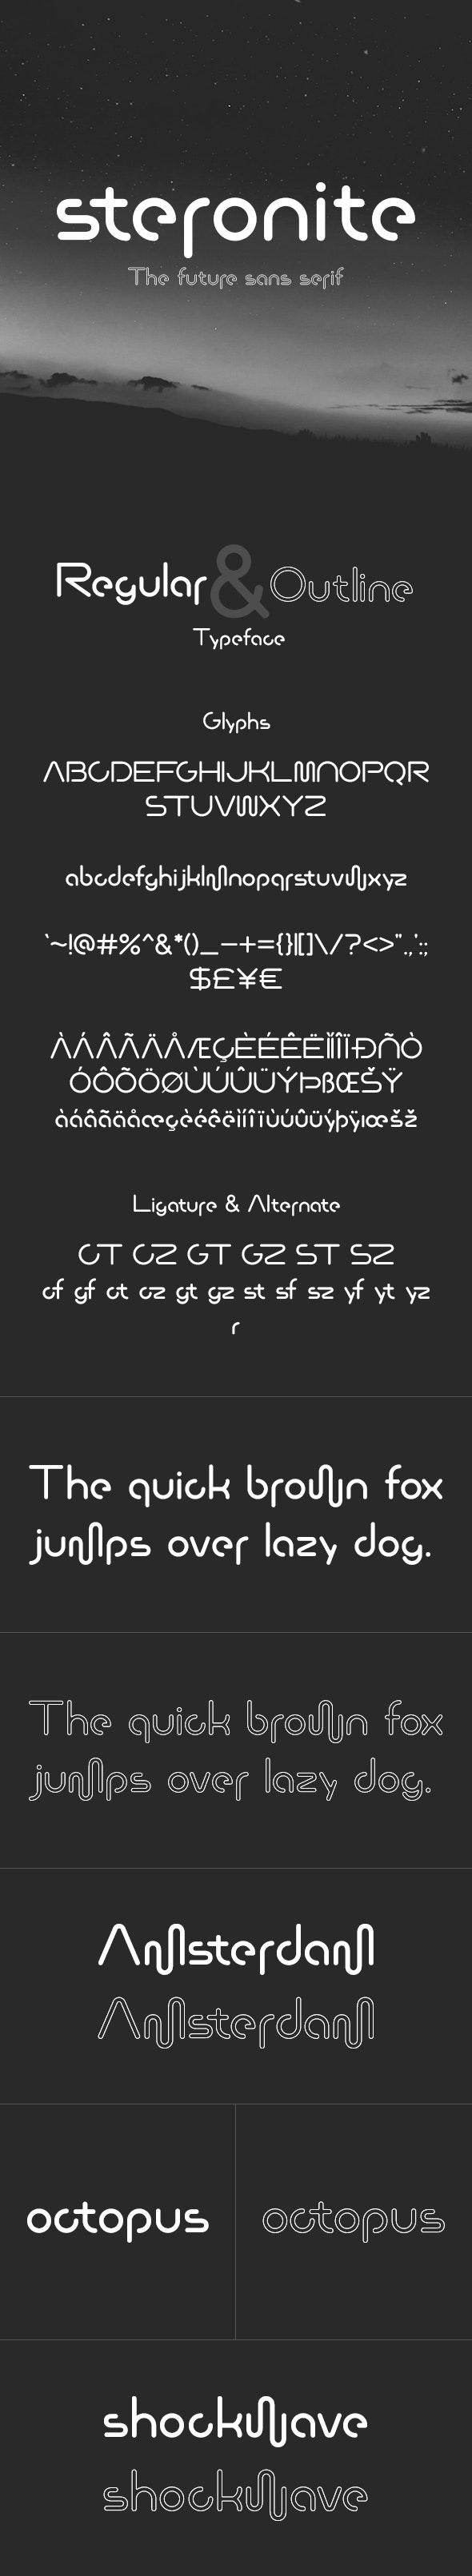 Steronite Font - Sans-Serif Fonts